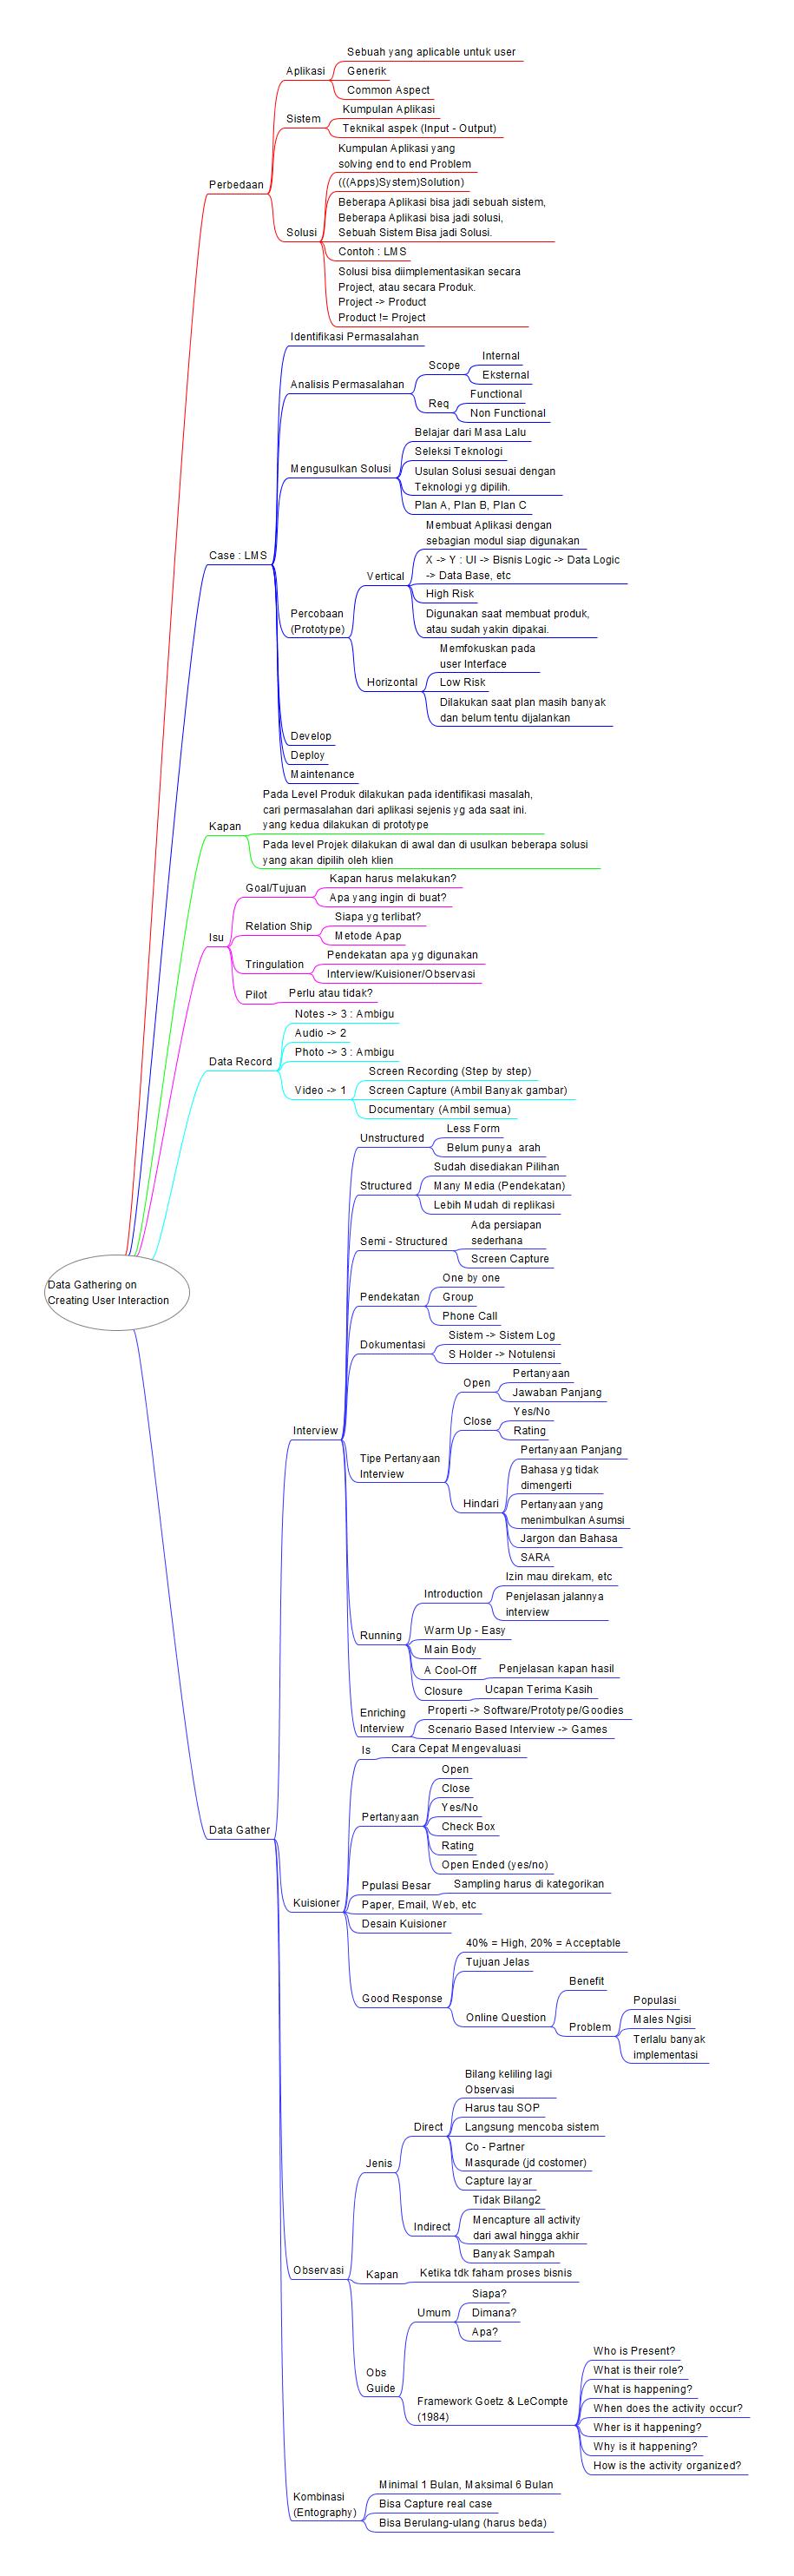 Data Gathering on Creating User Interaction